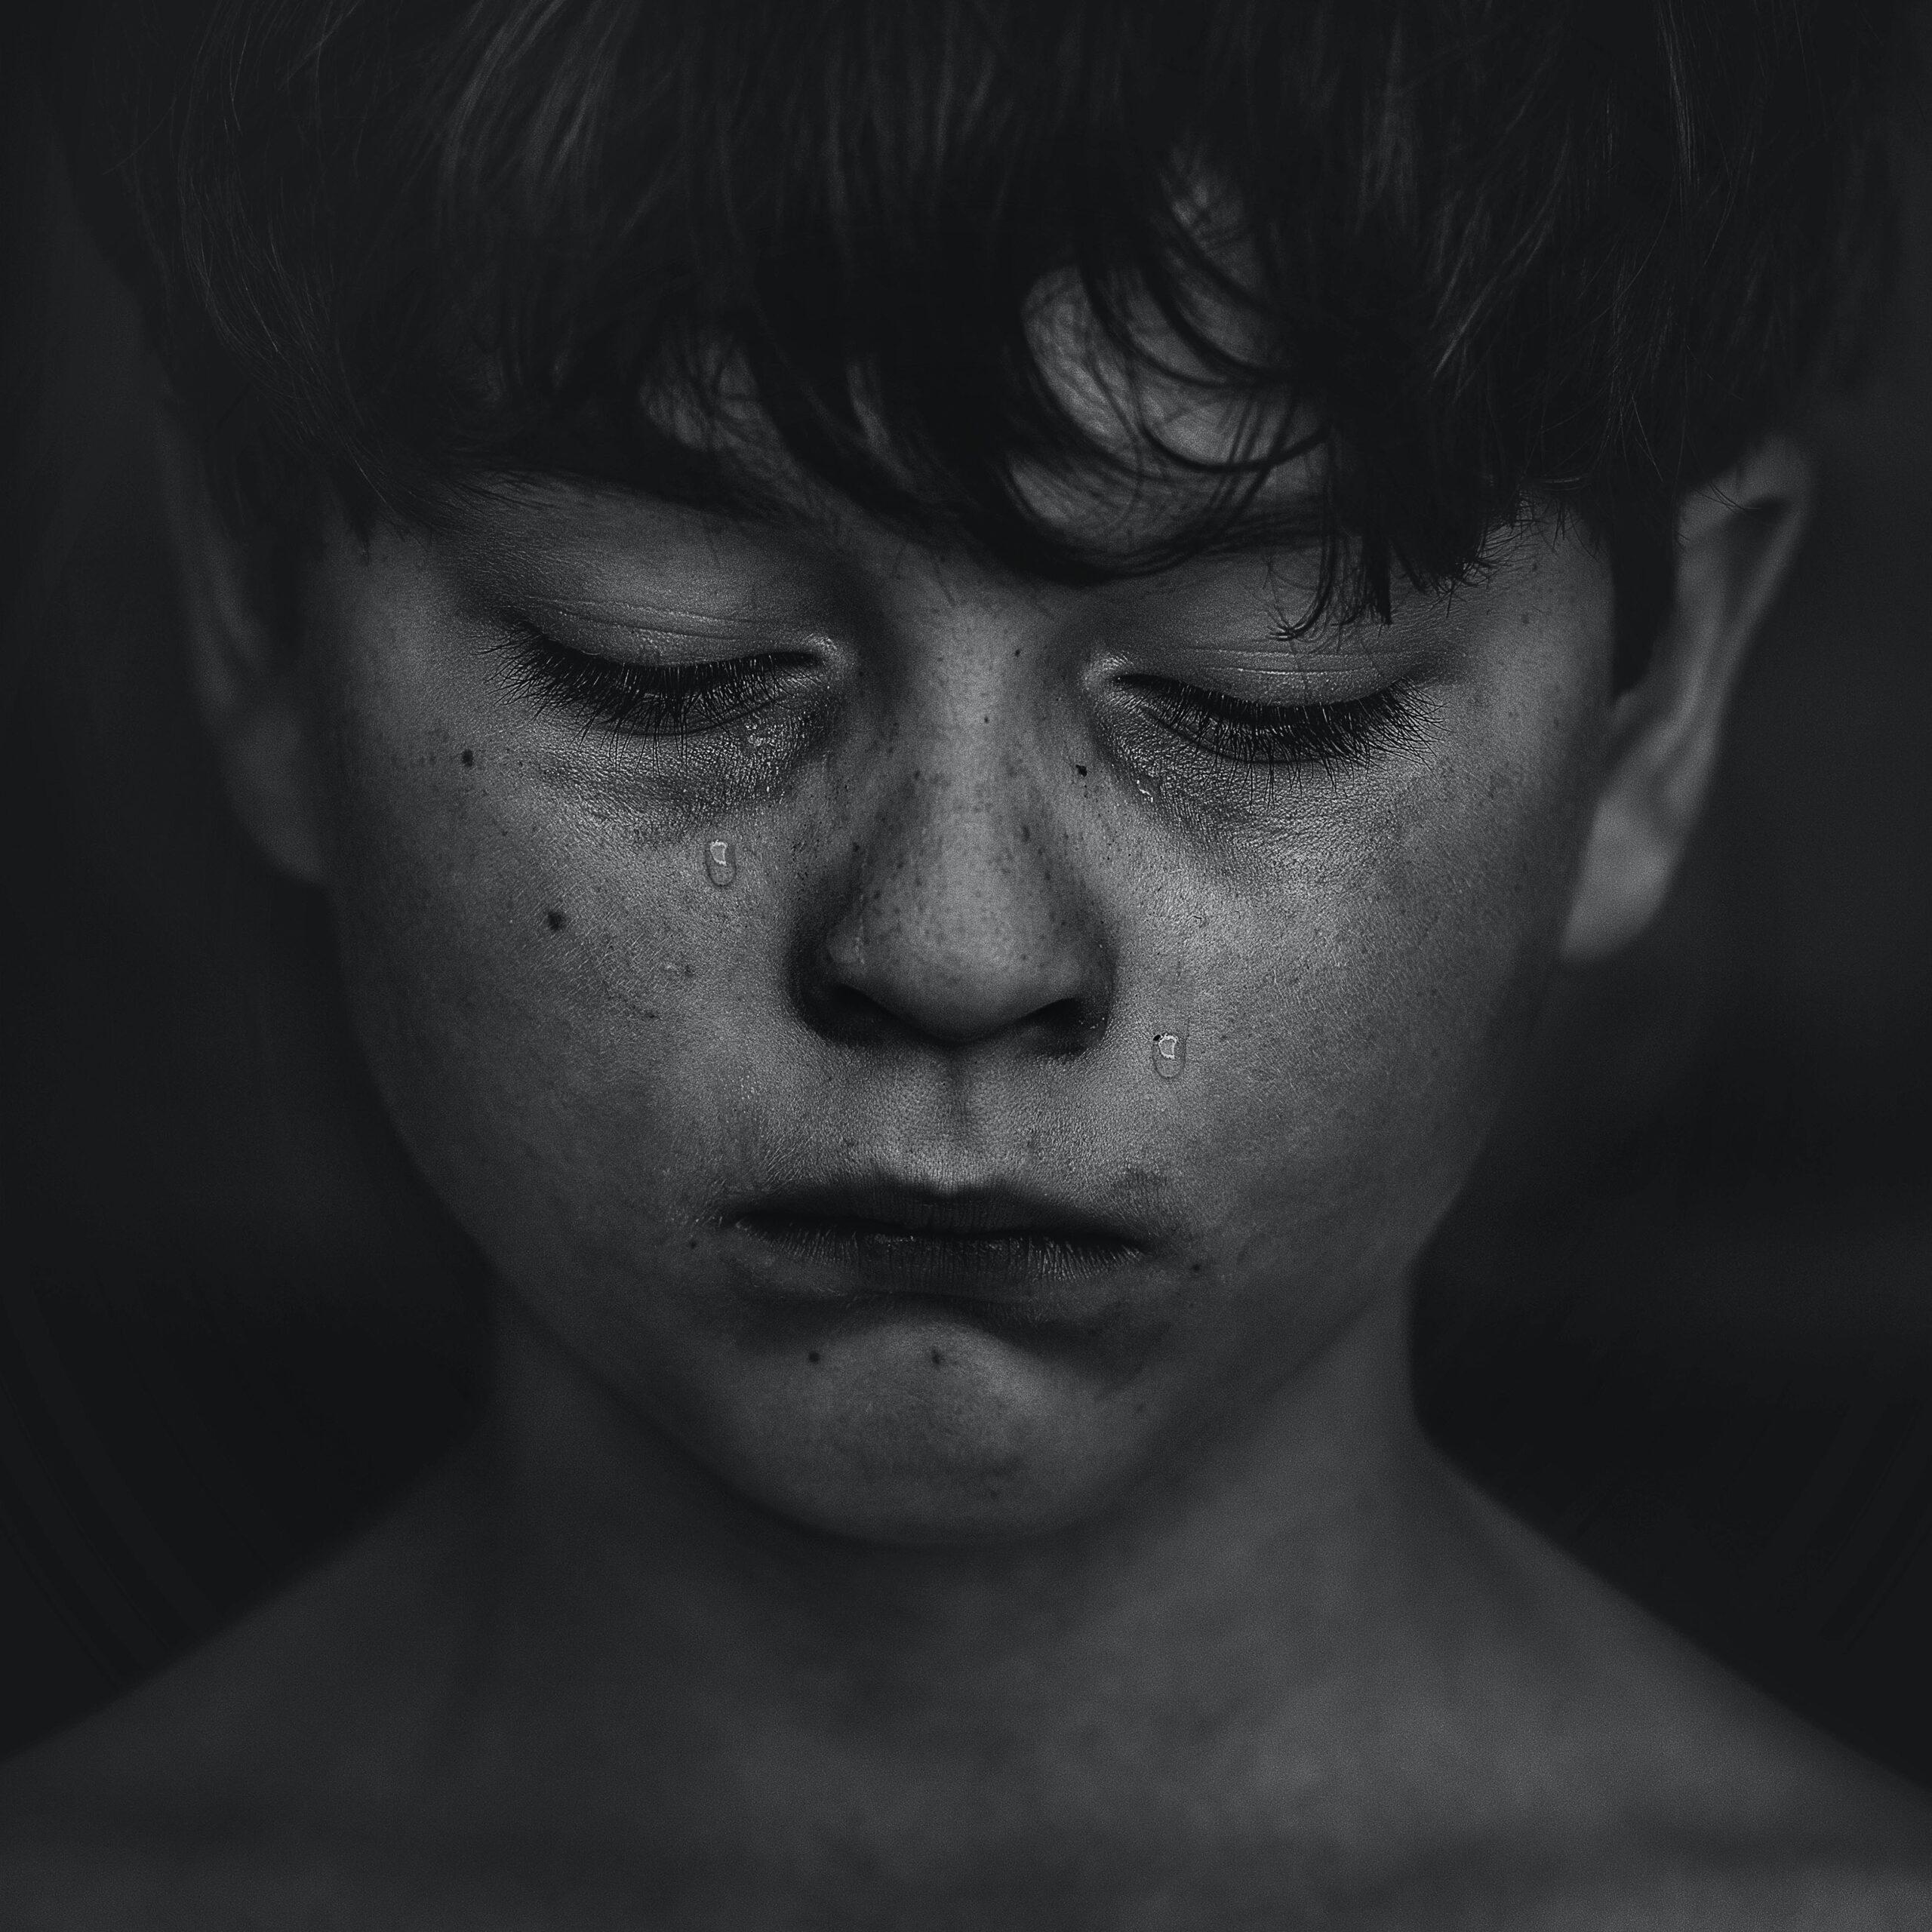 kat-j-young lad crying-unsplash